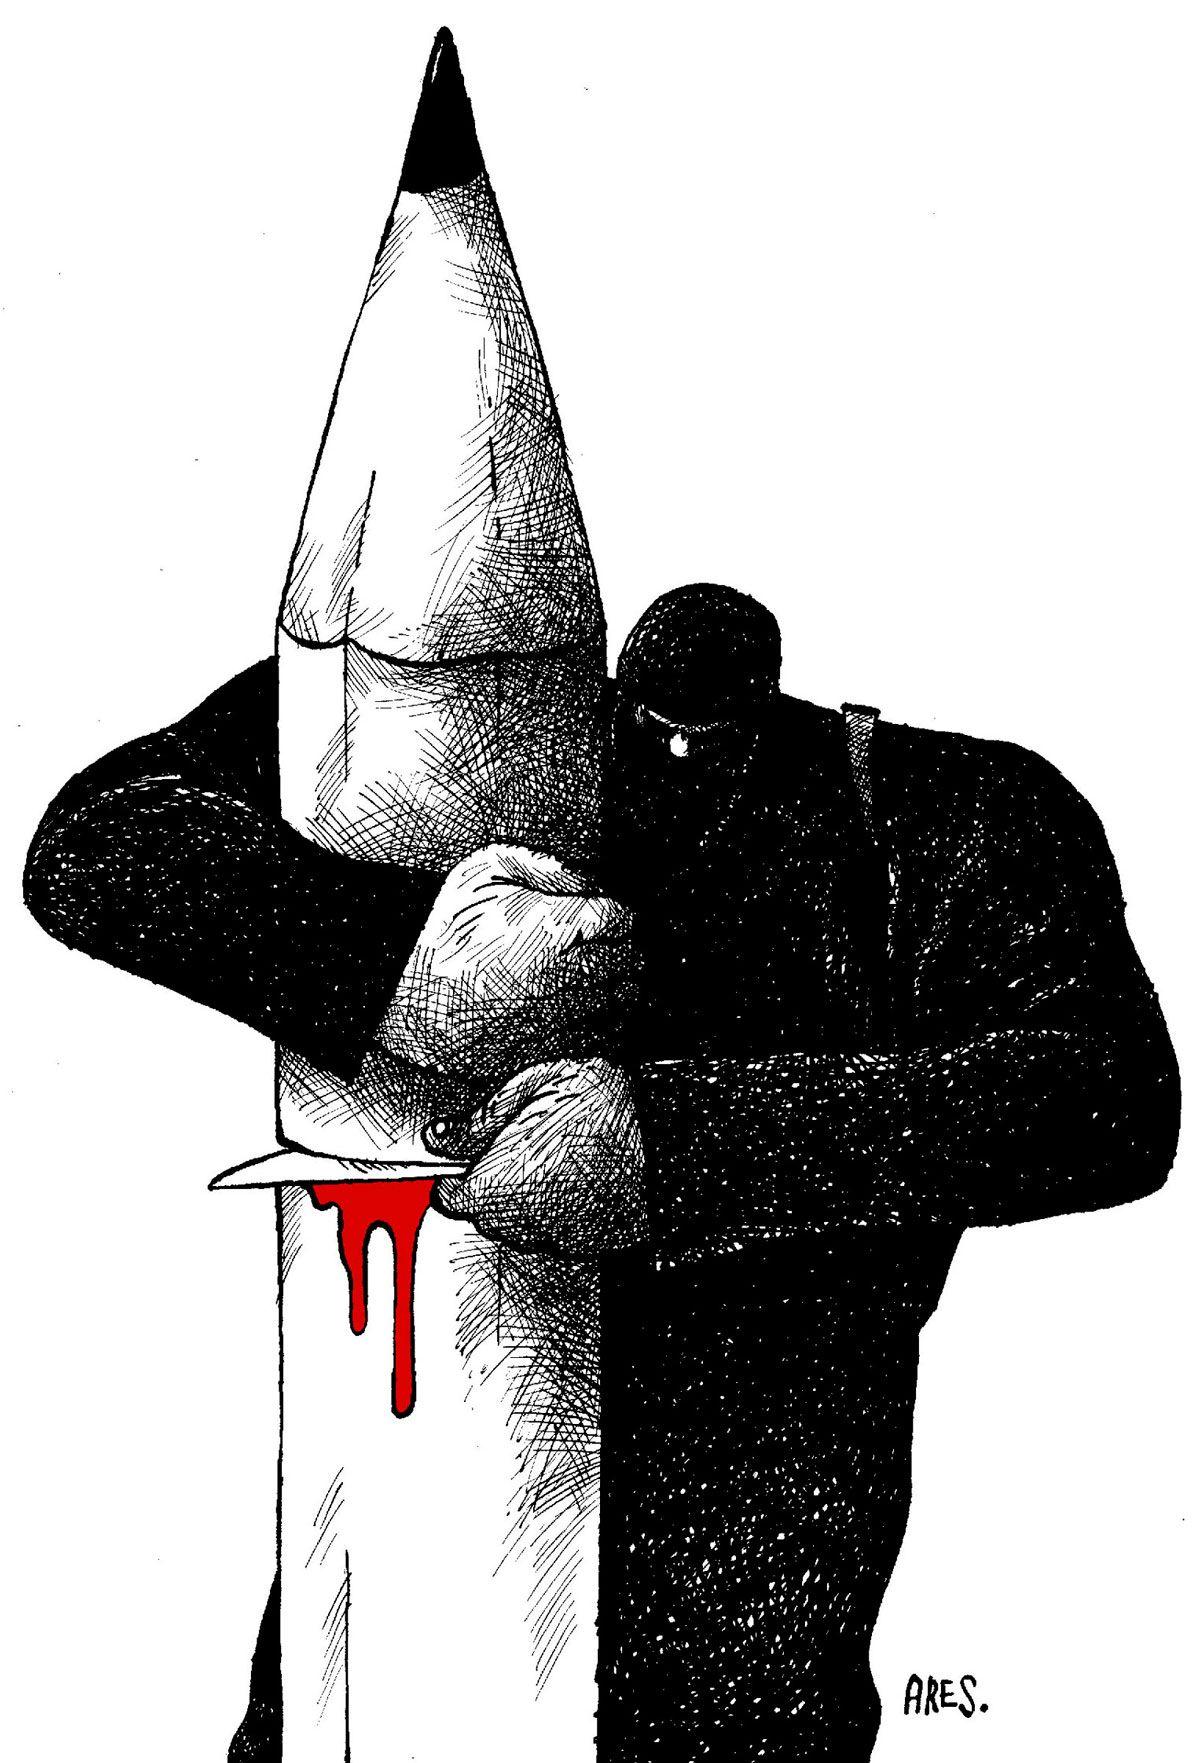 Dessinateurs du monde entier, tous Charlie #jesuischarlie #CharlieHebdo